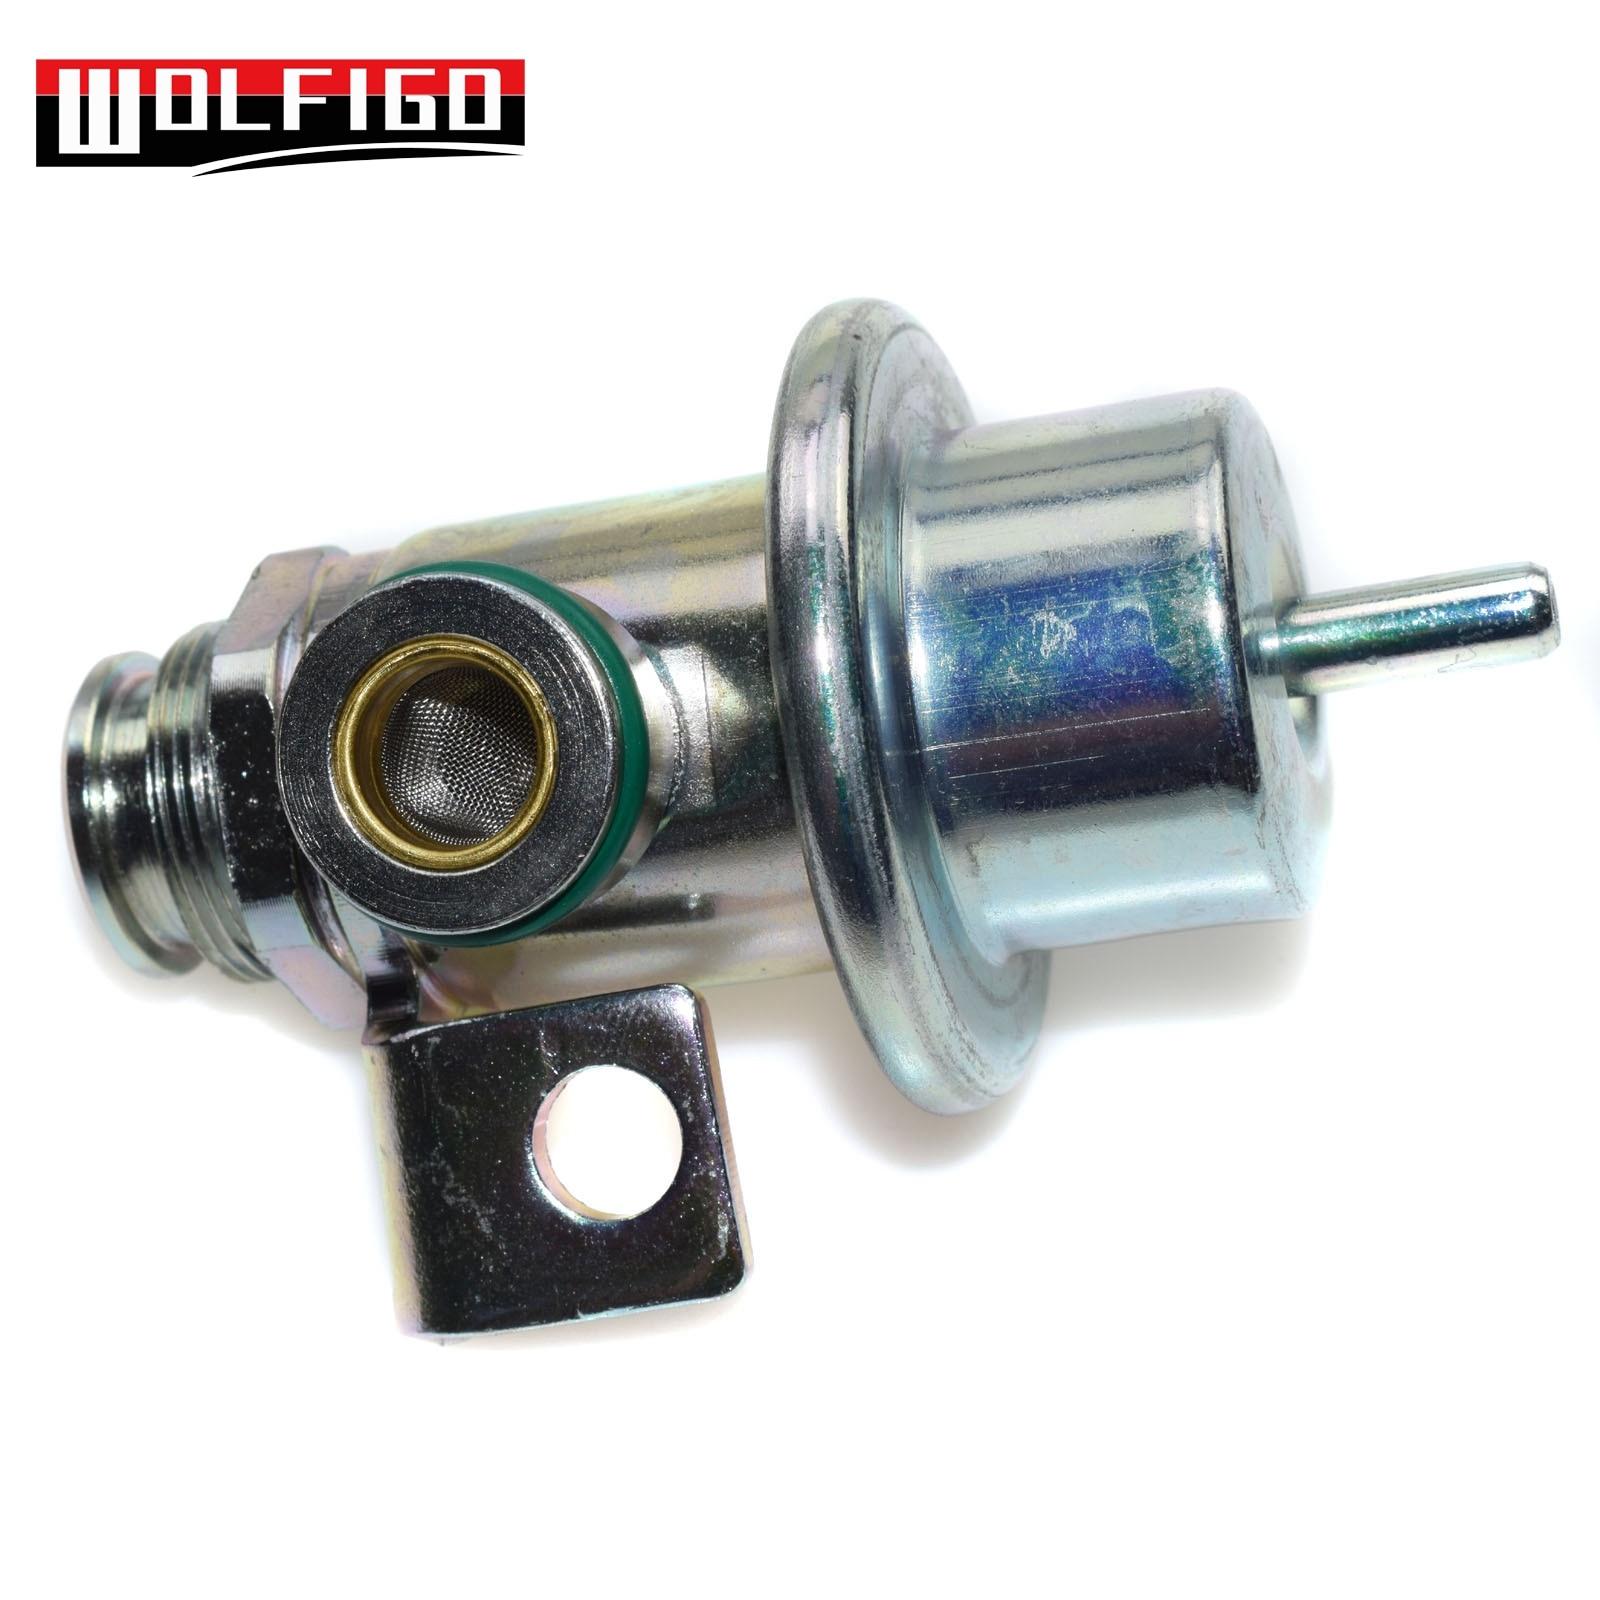 Fuel Injection Pressure Regulator Standard PR216